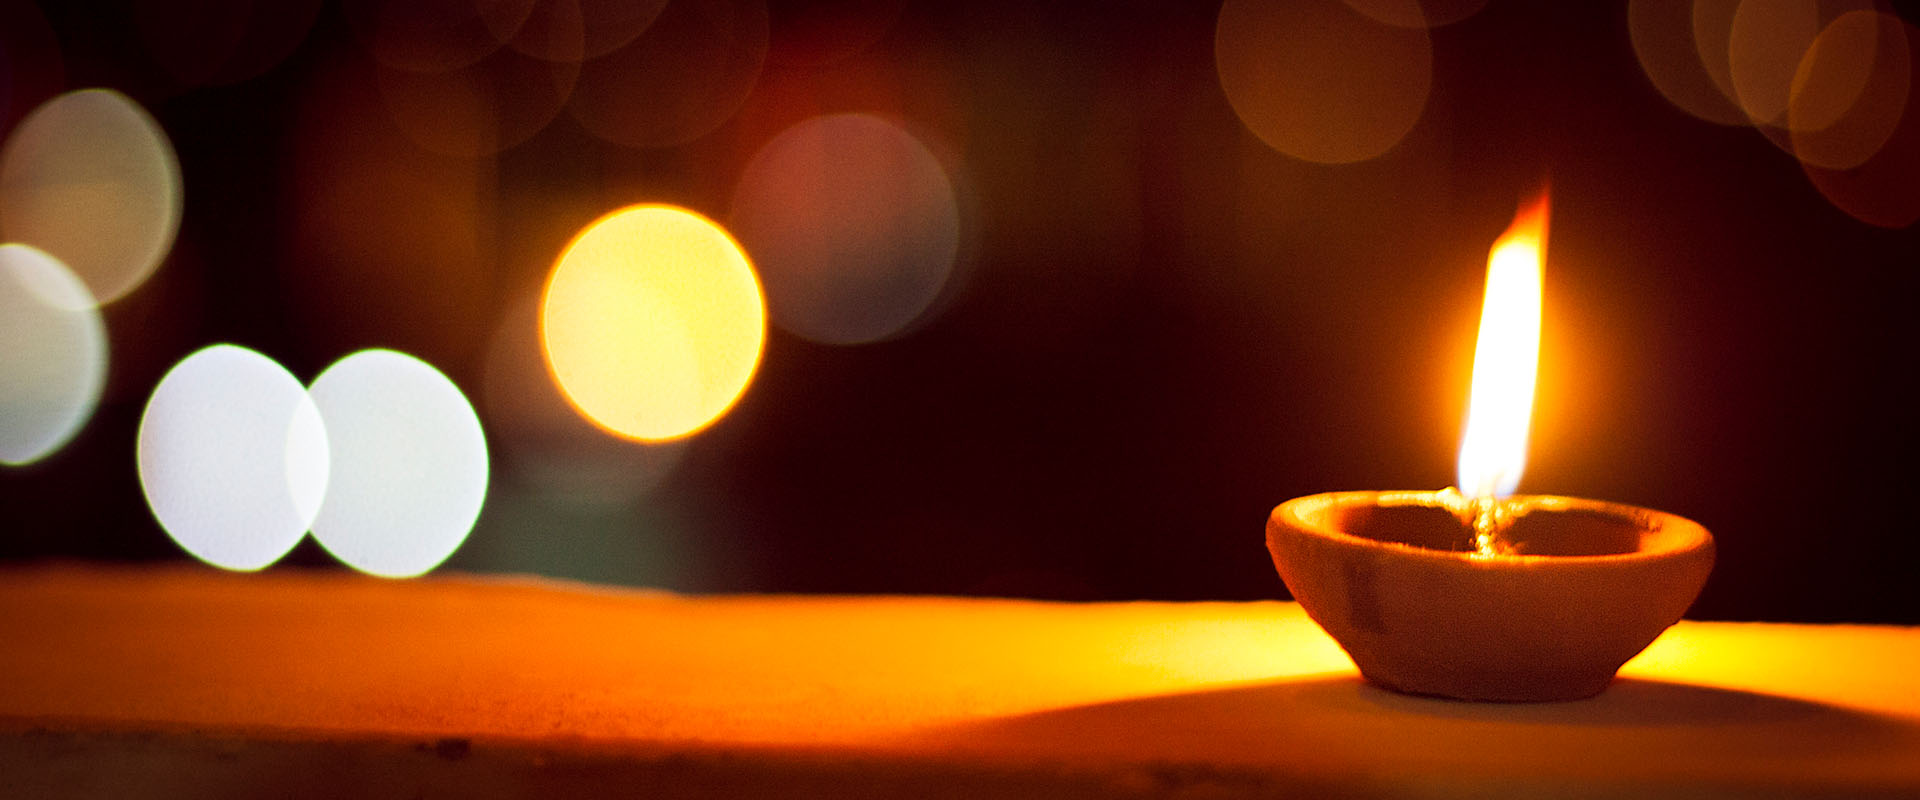 Diwali Deepavali 2021 2022 And 2023 Publicholidays In